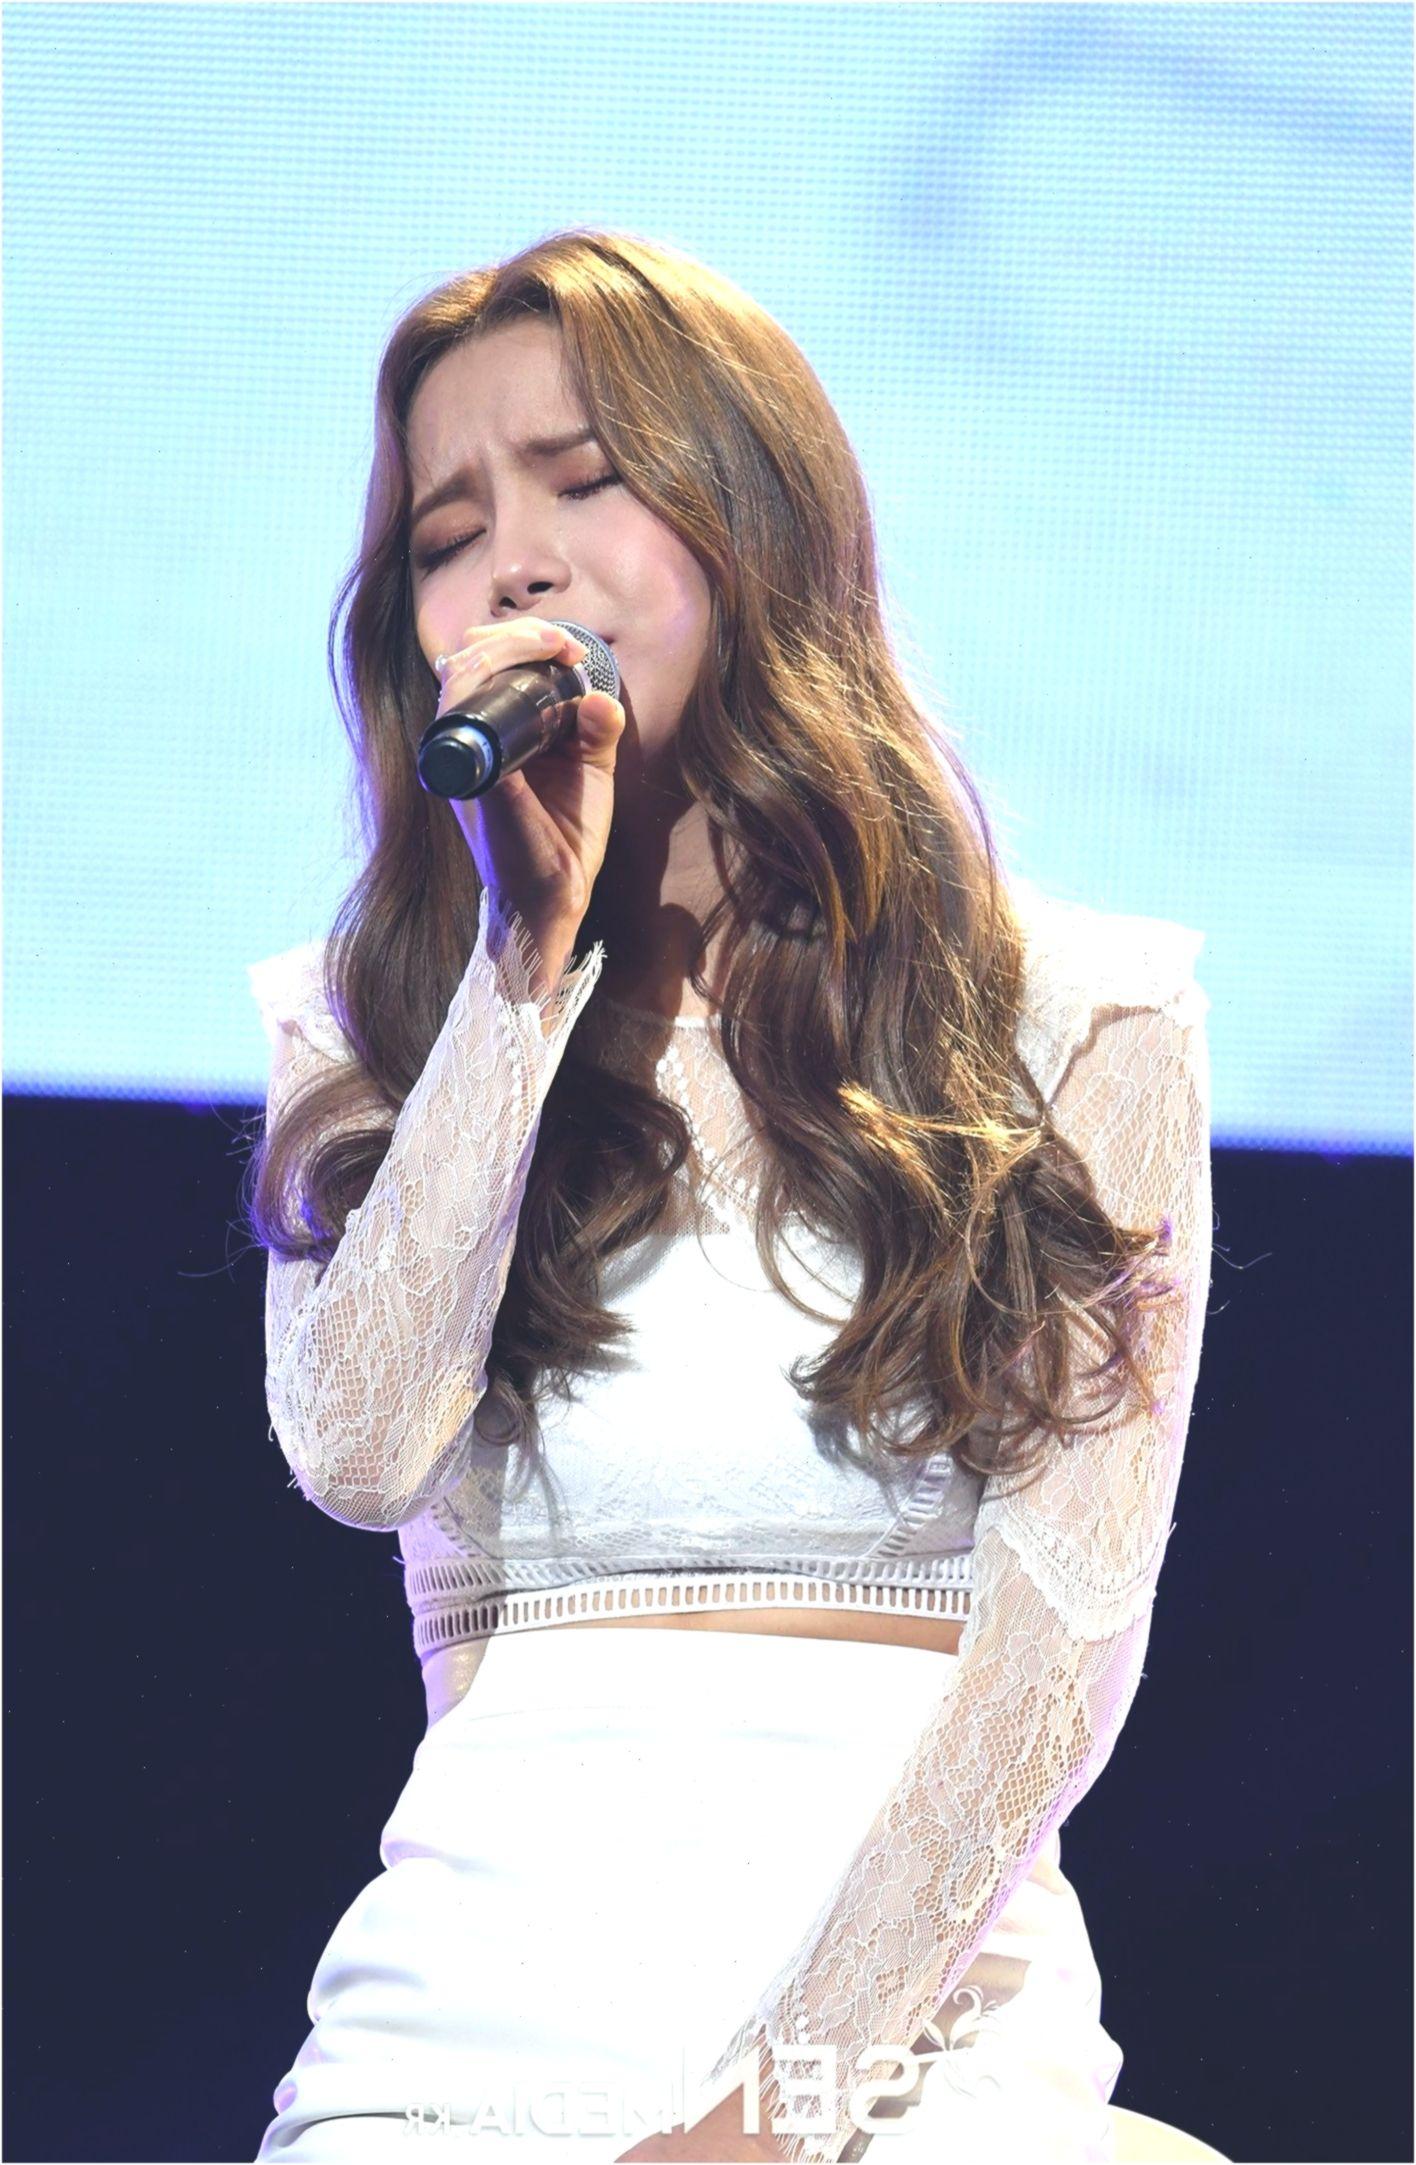 Korea Korean Kpop Idol Girl Band Gruppe Mamamoo Solars Goddess Waves Frisurenlang Koreanhairstyleslon Korean Hairstyle Long Hair Styles Korean Hairstyle Long